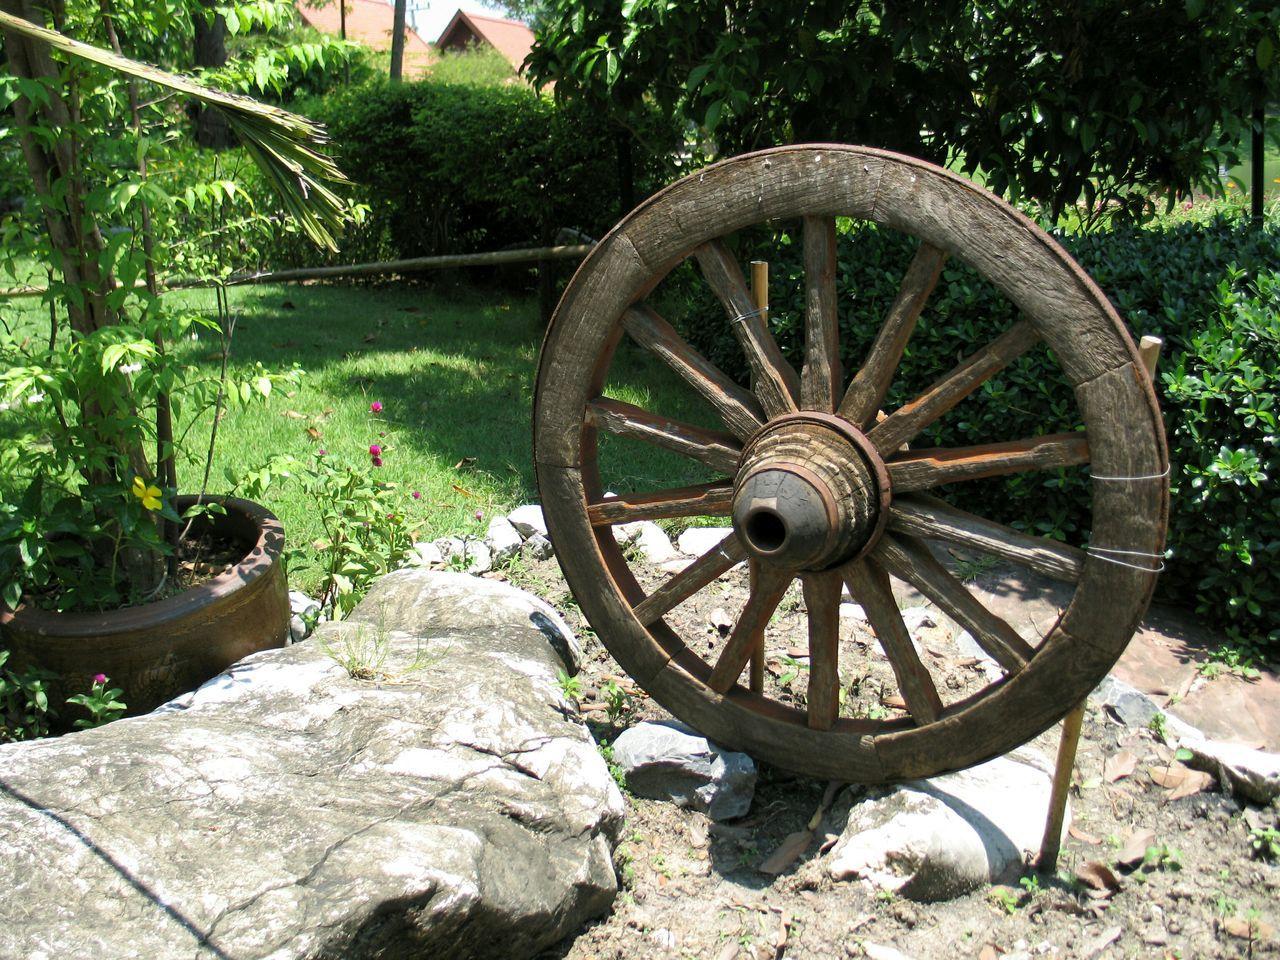 Wooden wheel in park